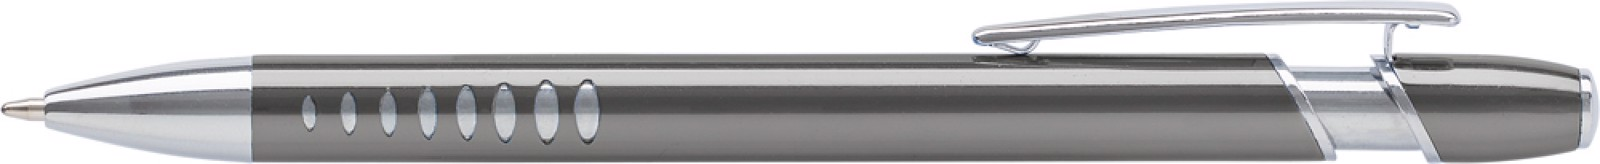 Aluminium ballpen with UV coating - Grey